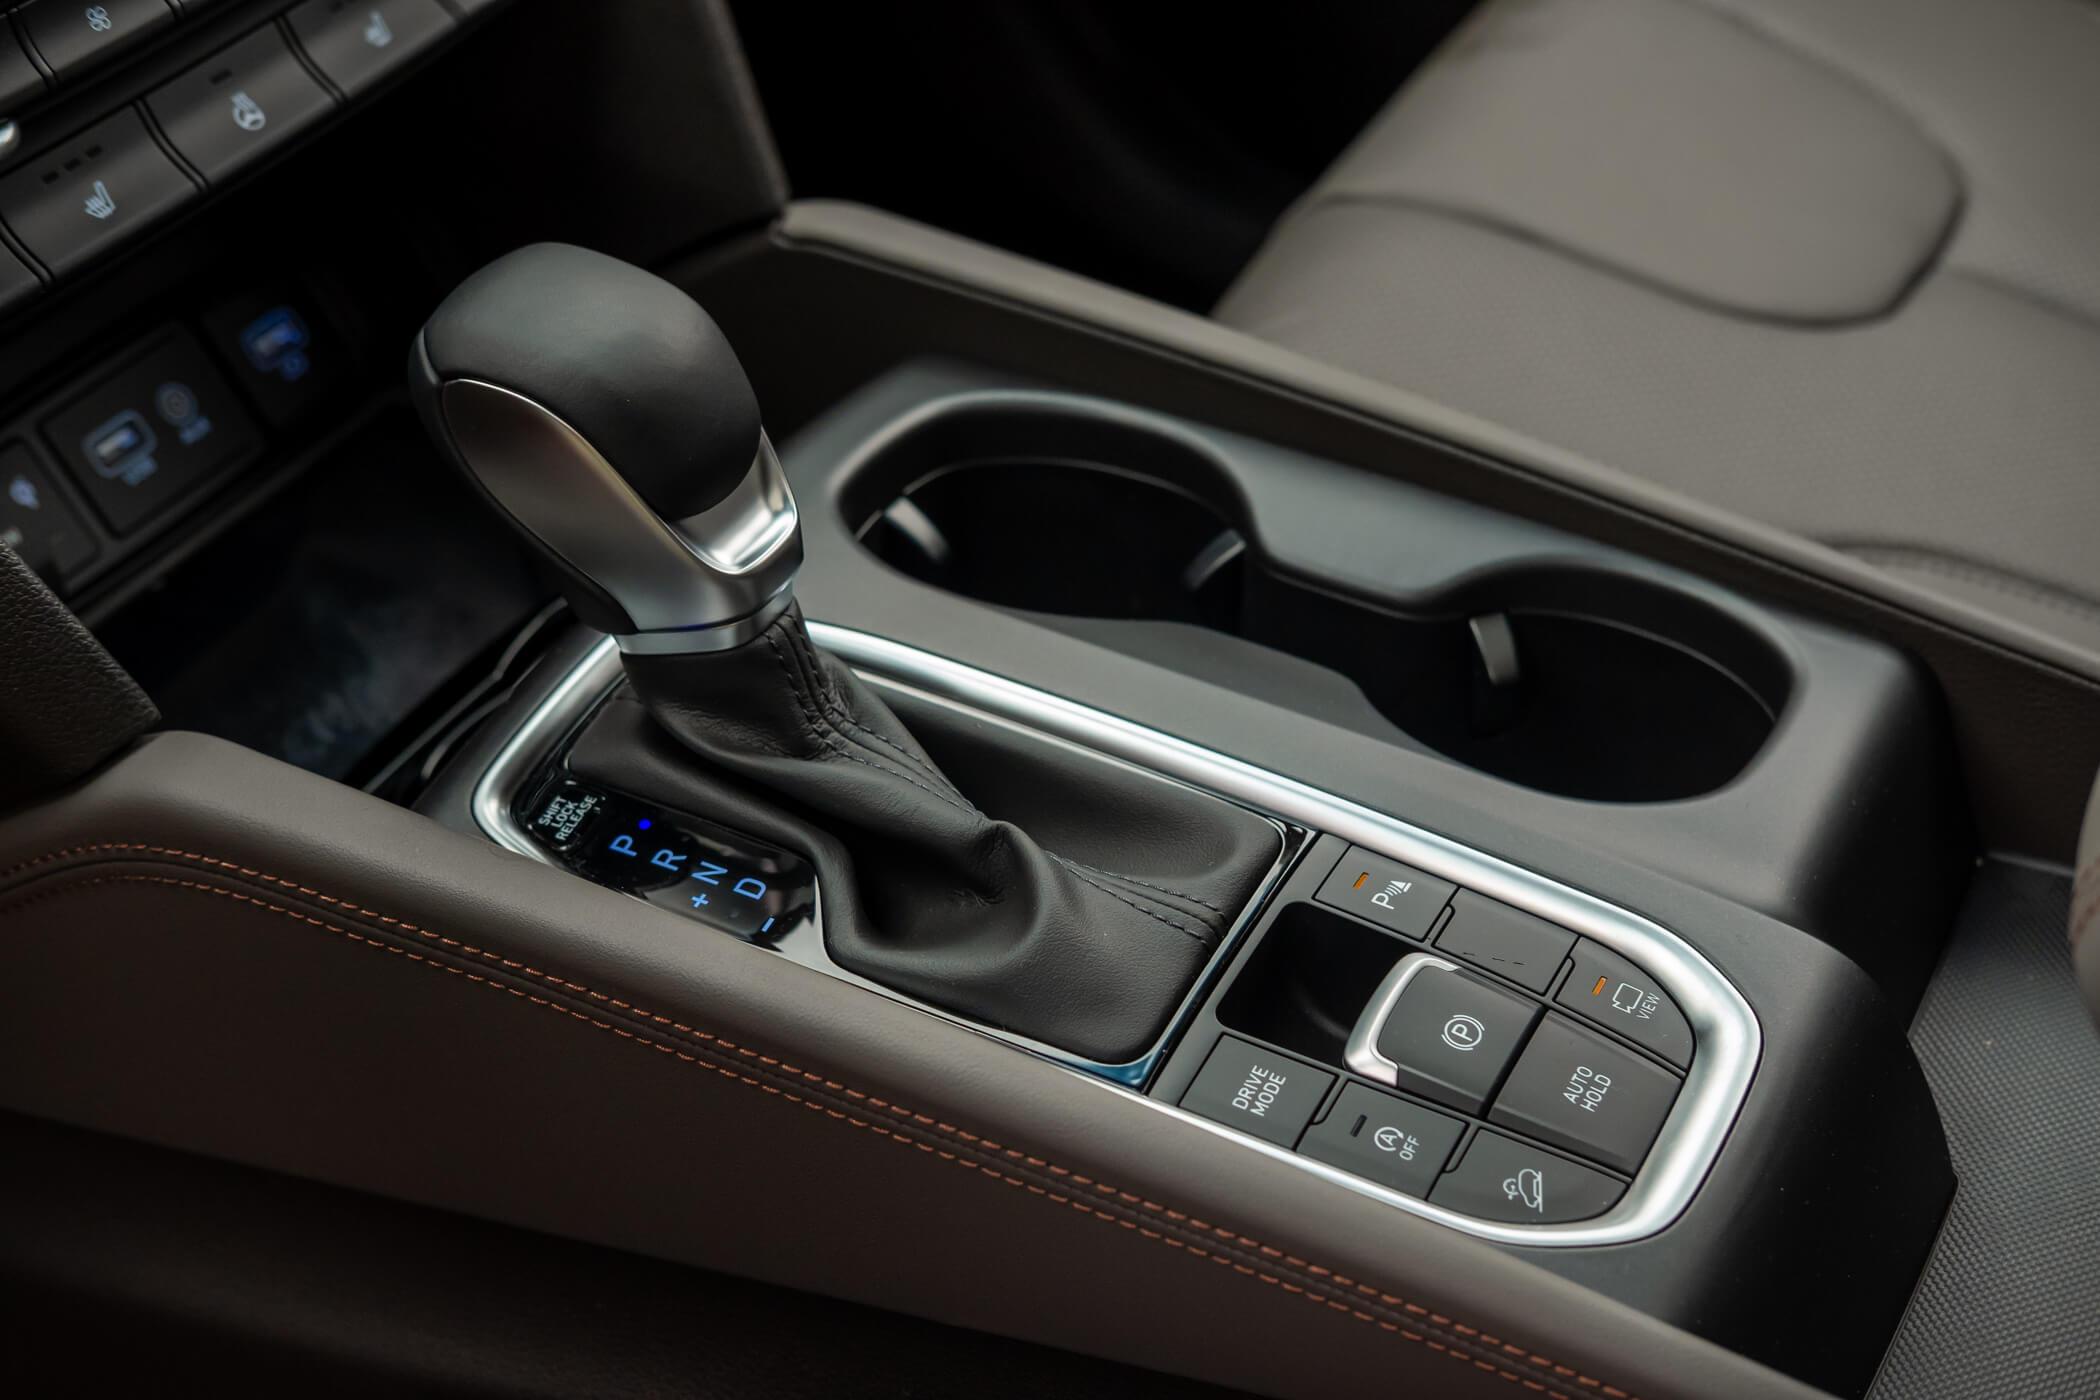 Consola central do Hyundai Santa Fé